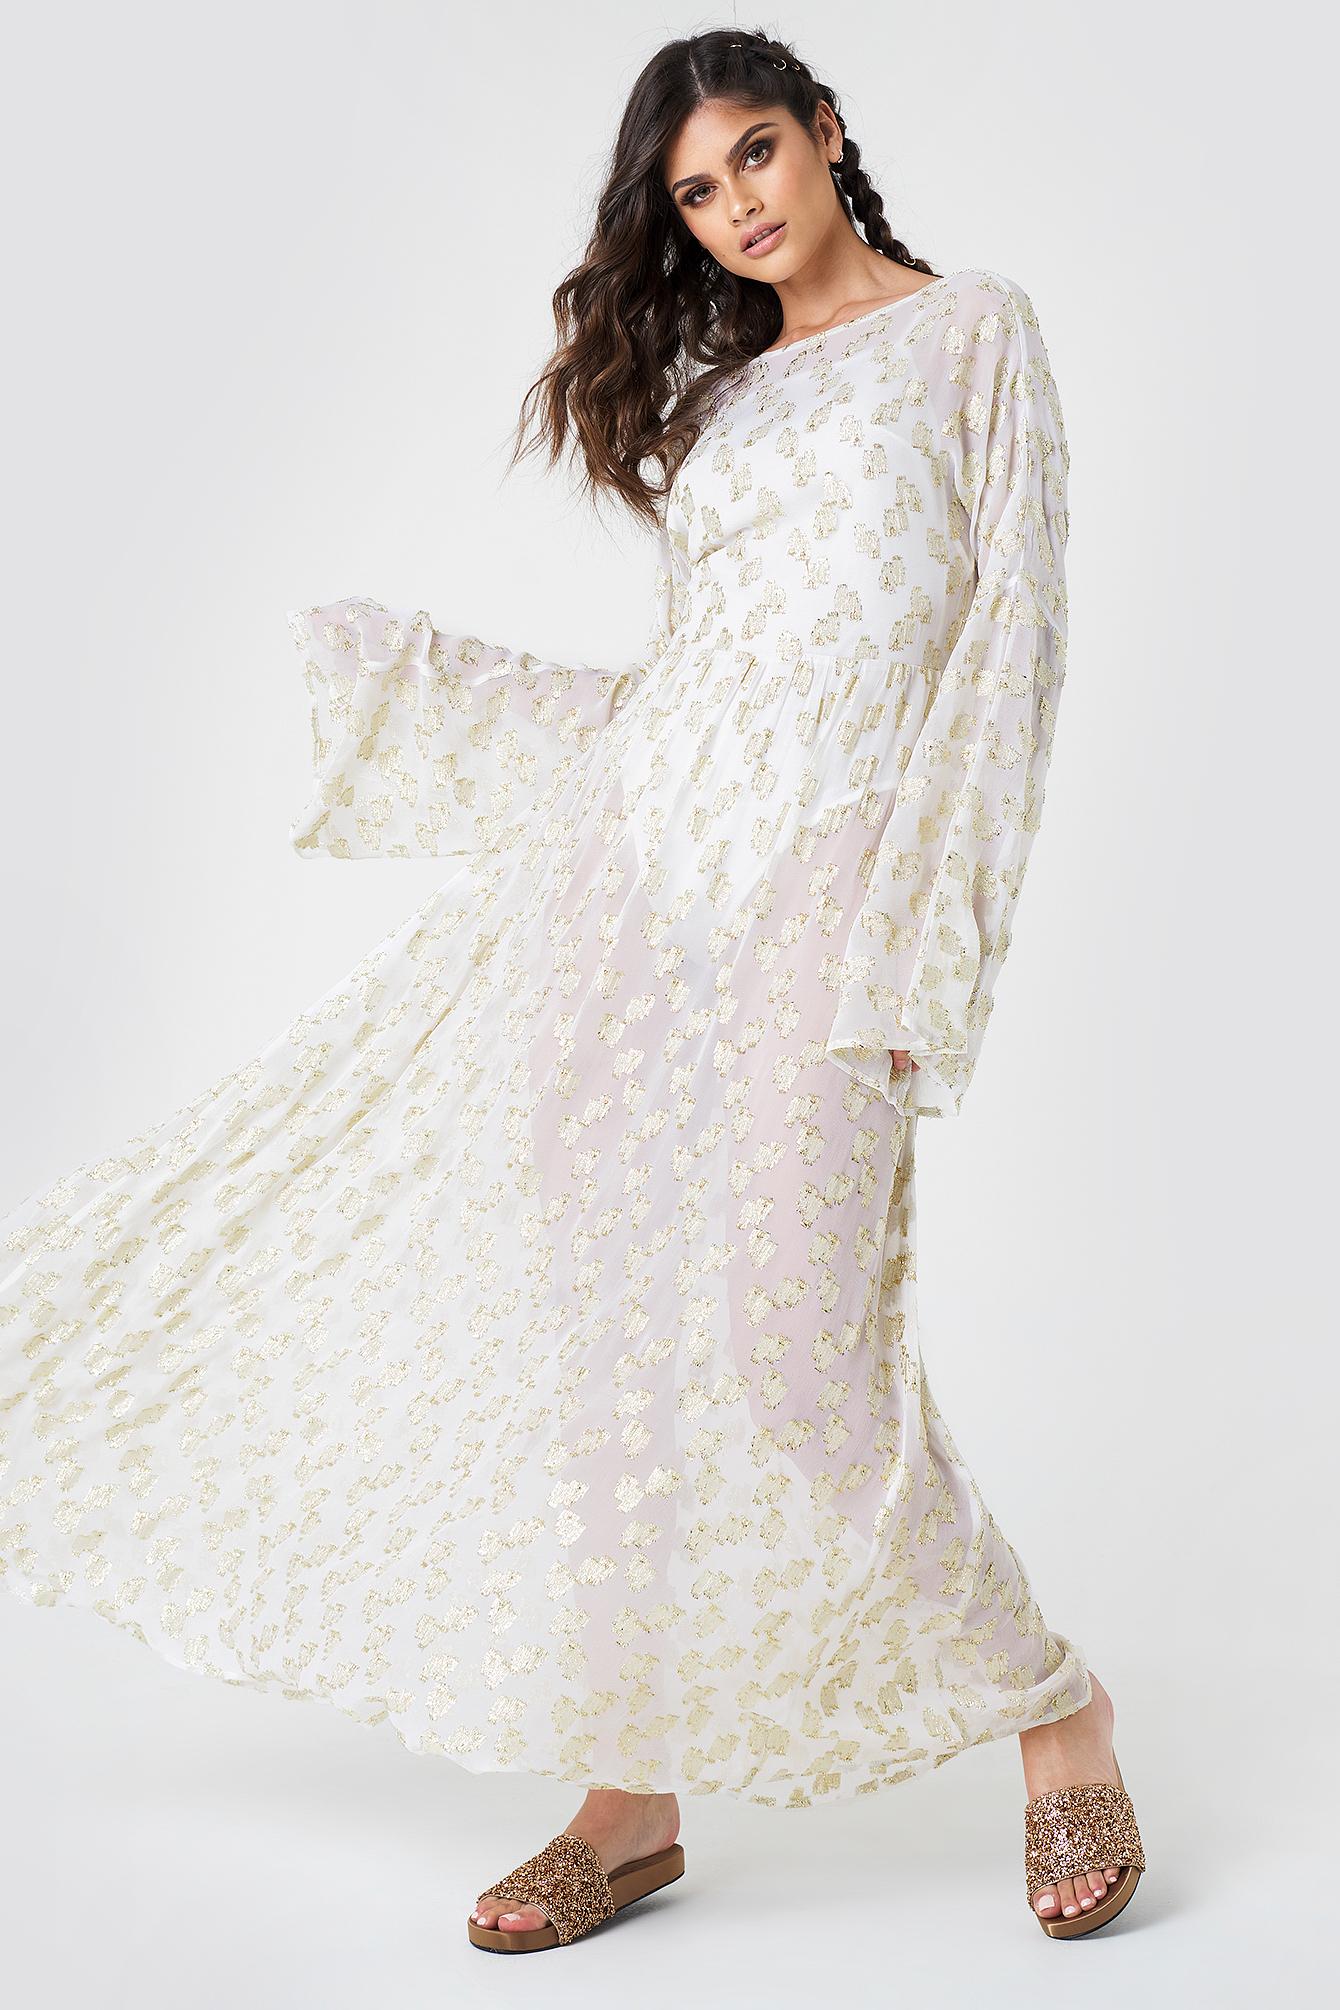 Sparkly White Maxi Dresses